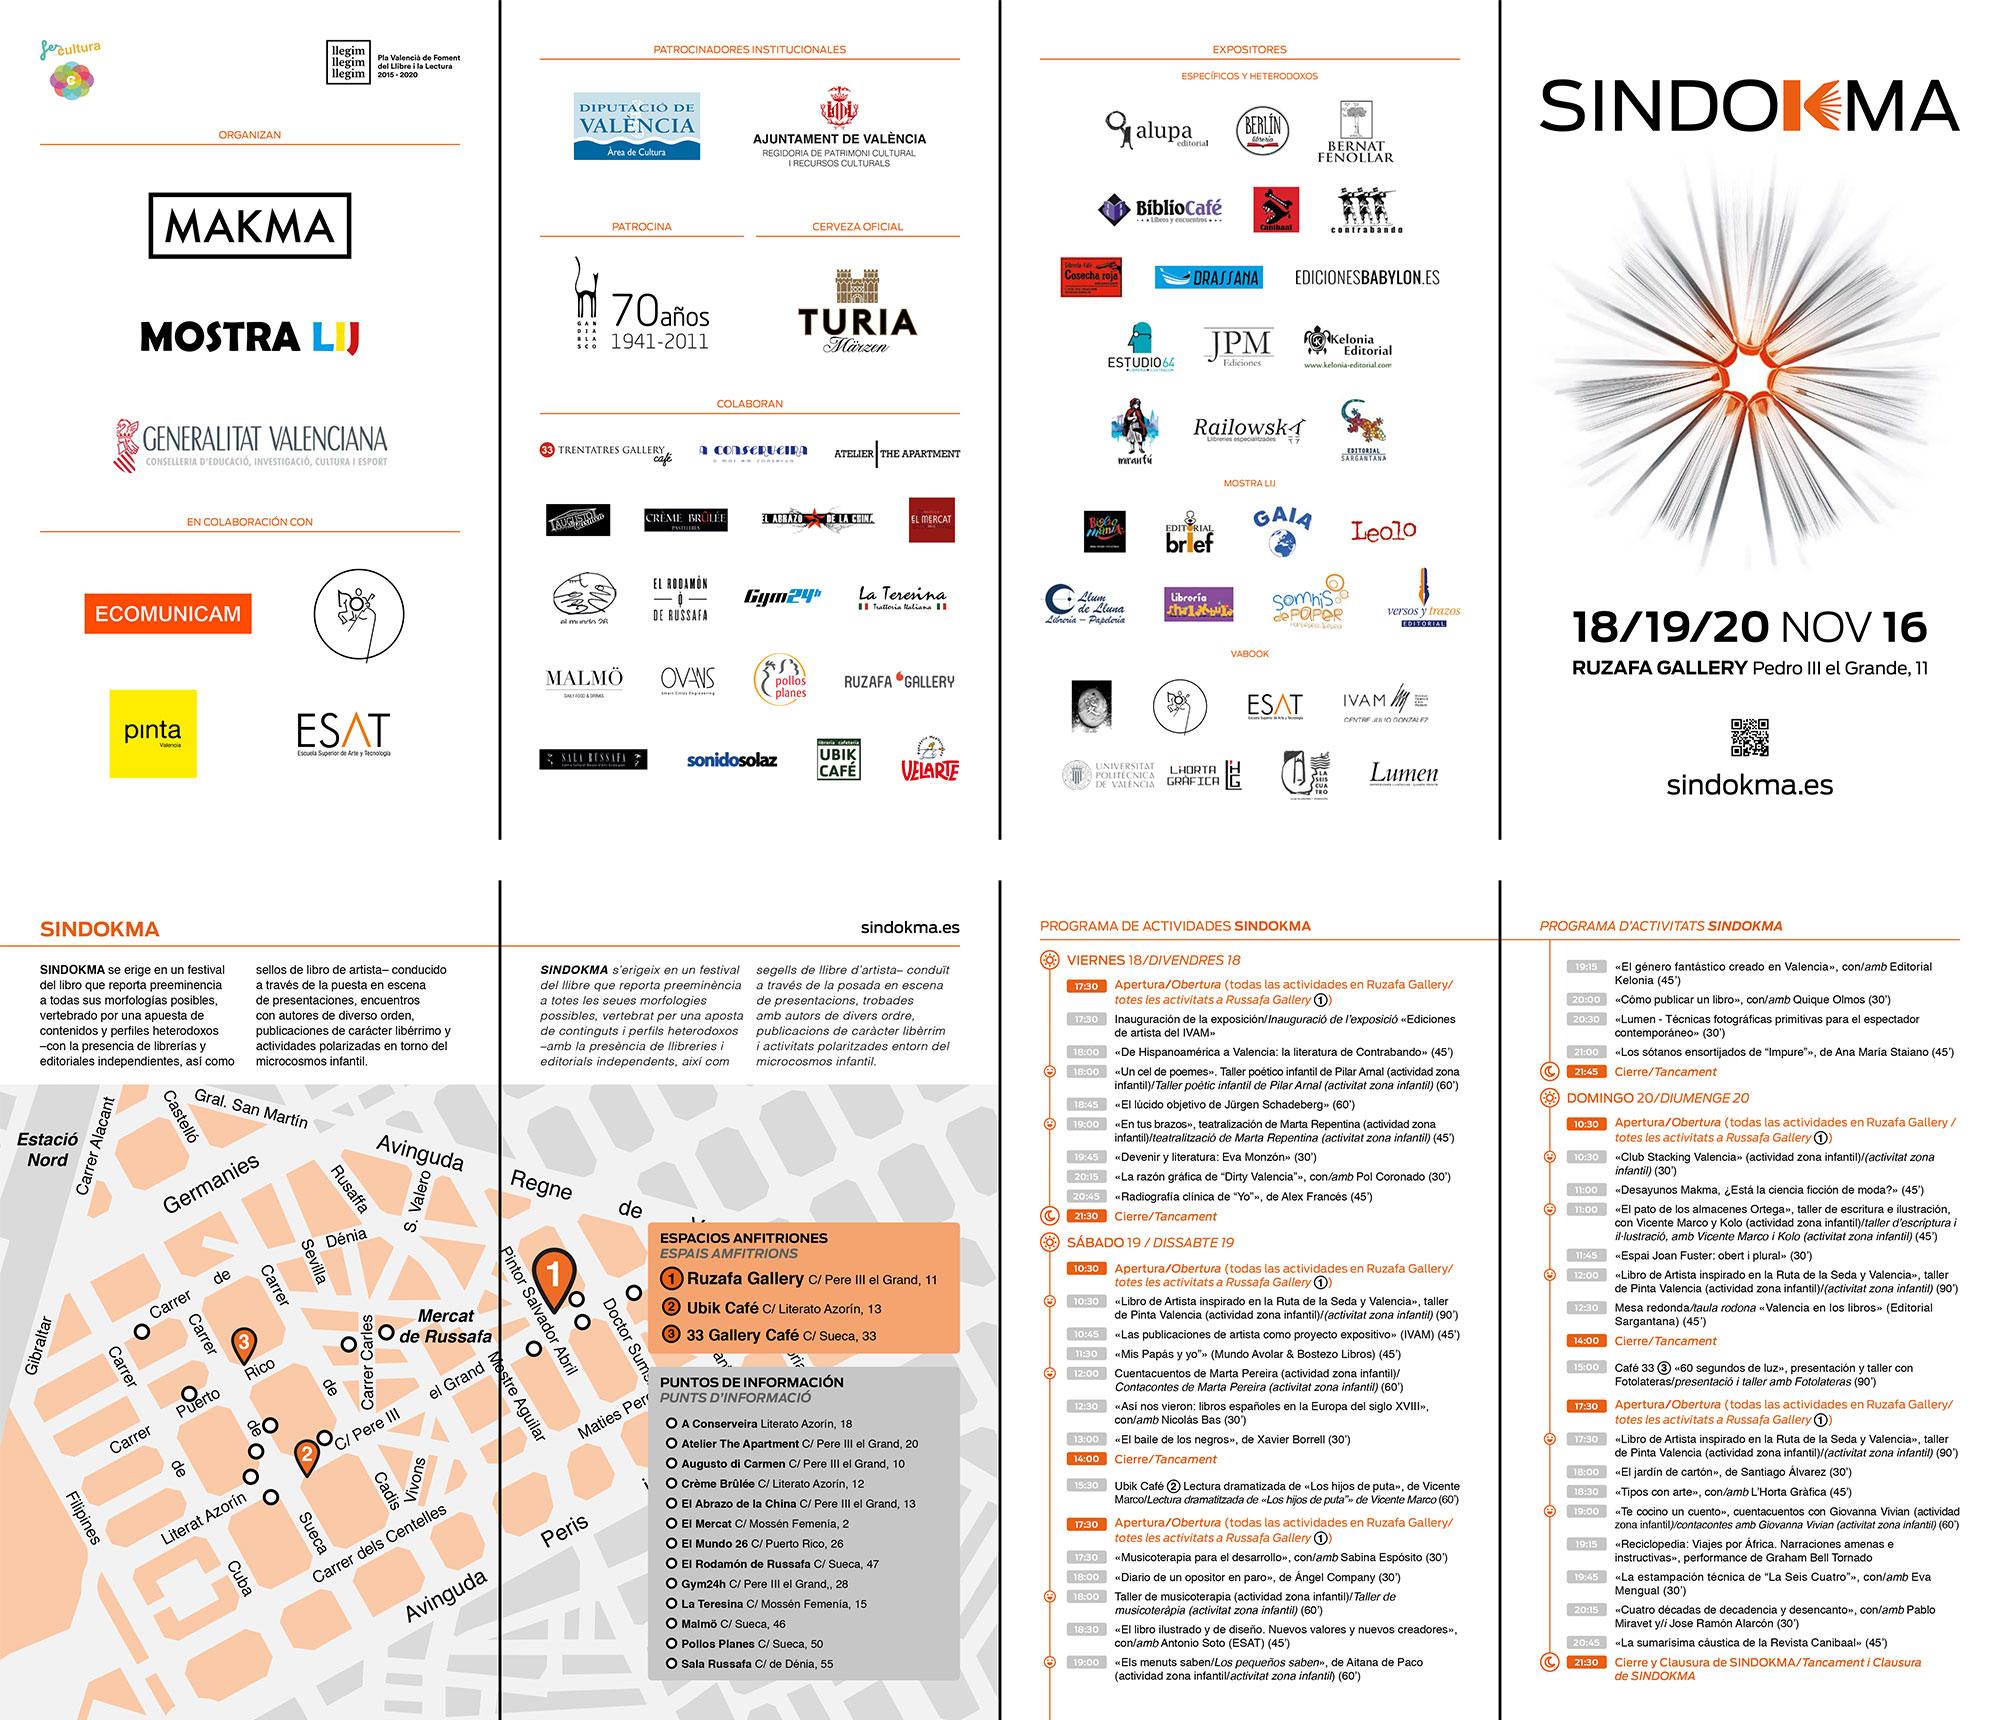 Sindokma 2016 Programa